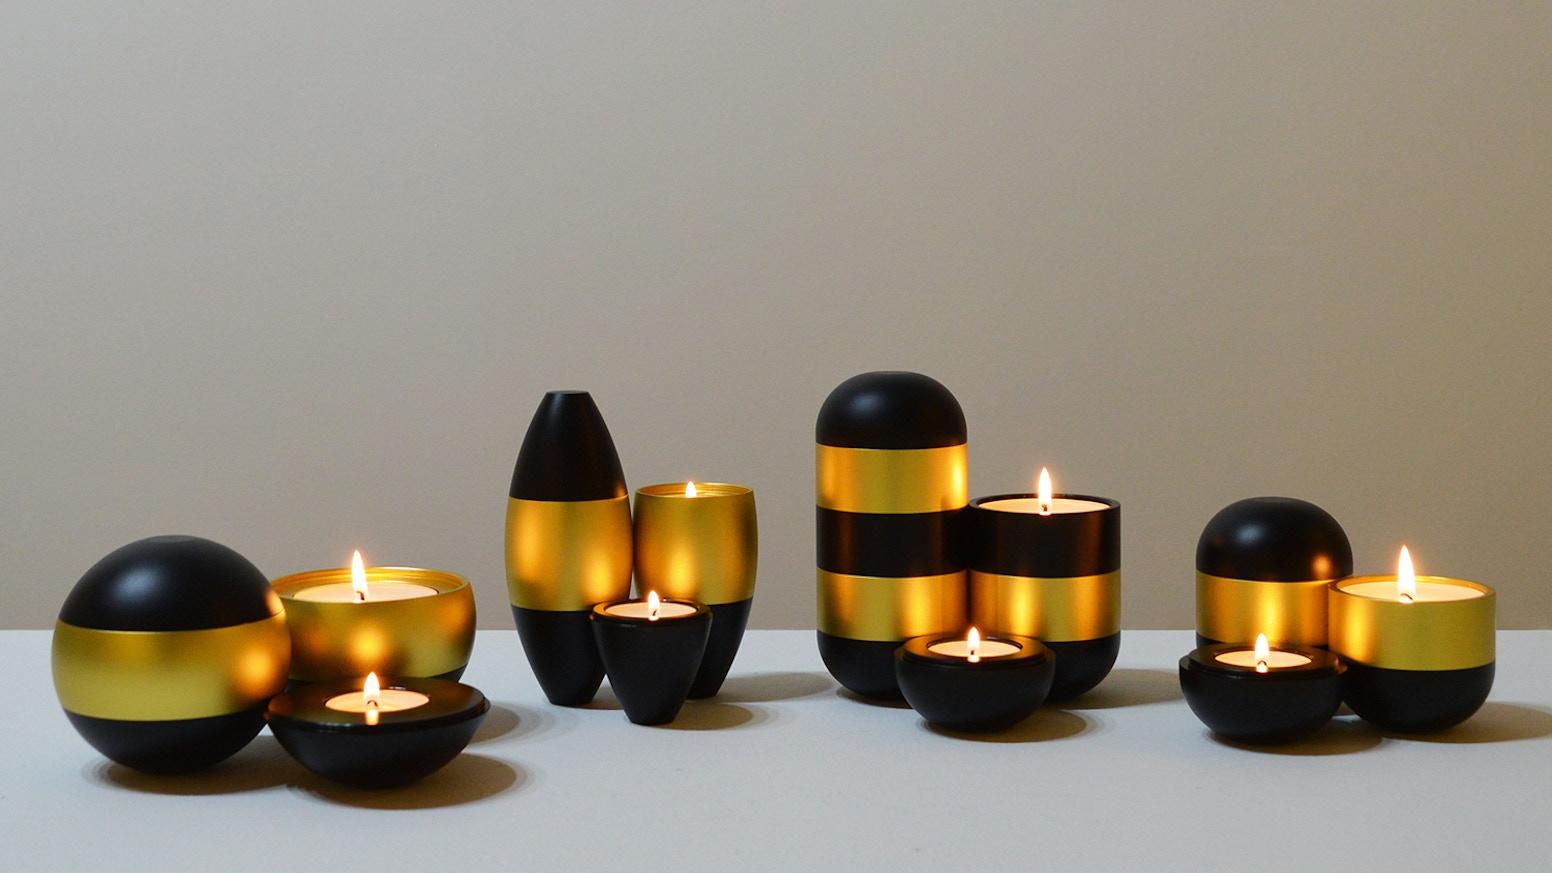 Interlocking Candle Holders